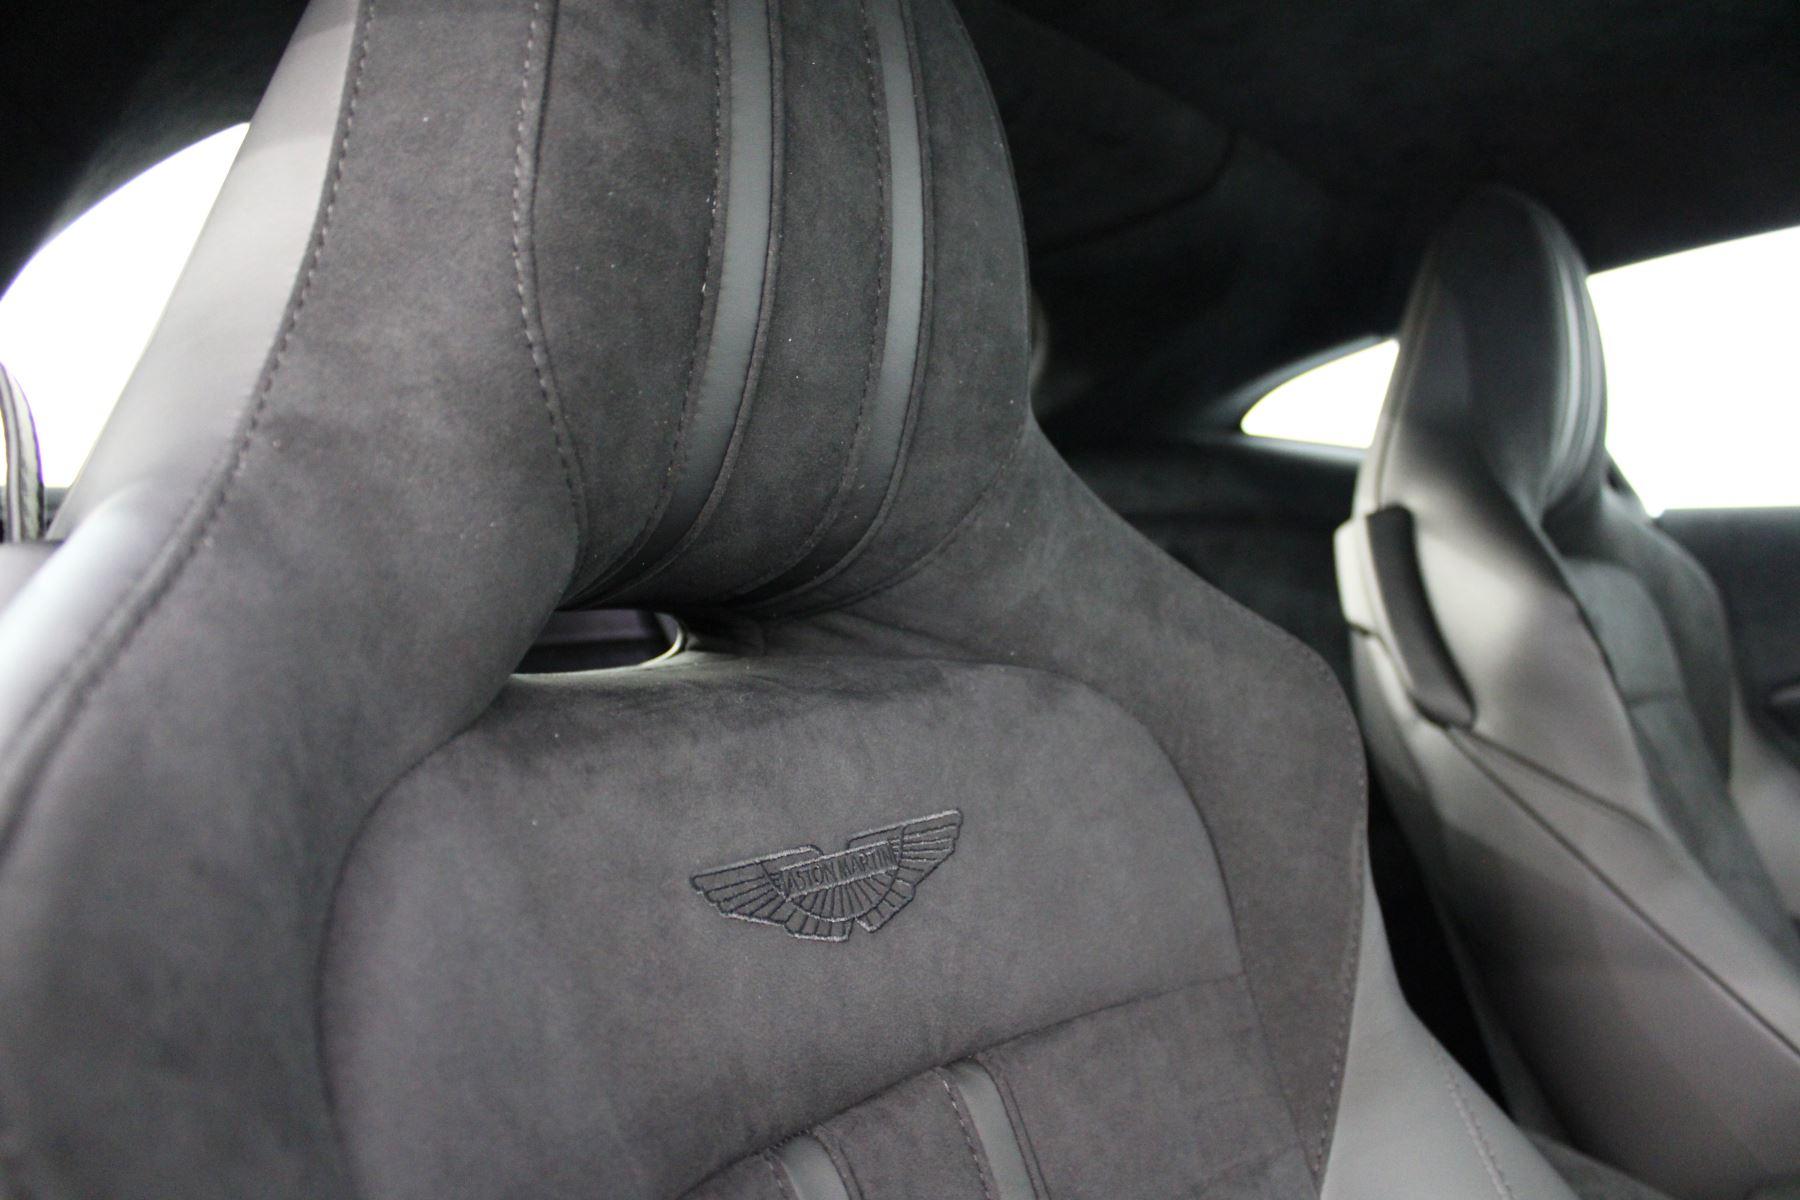 Aston Martin New Vantage 2dr image 22